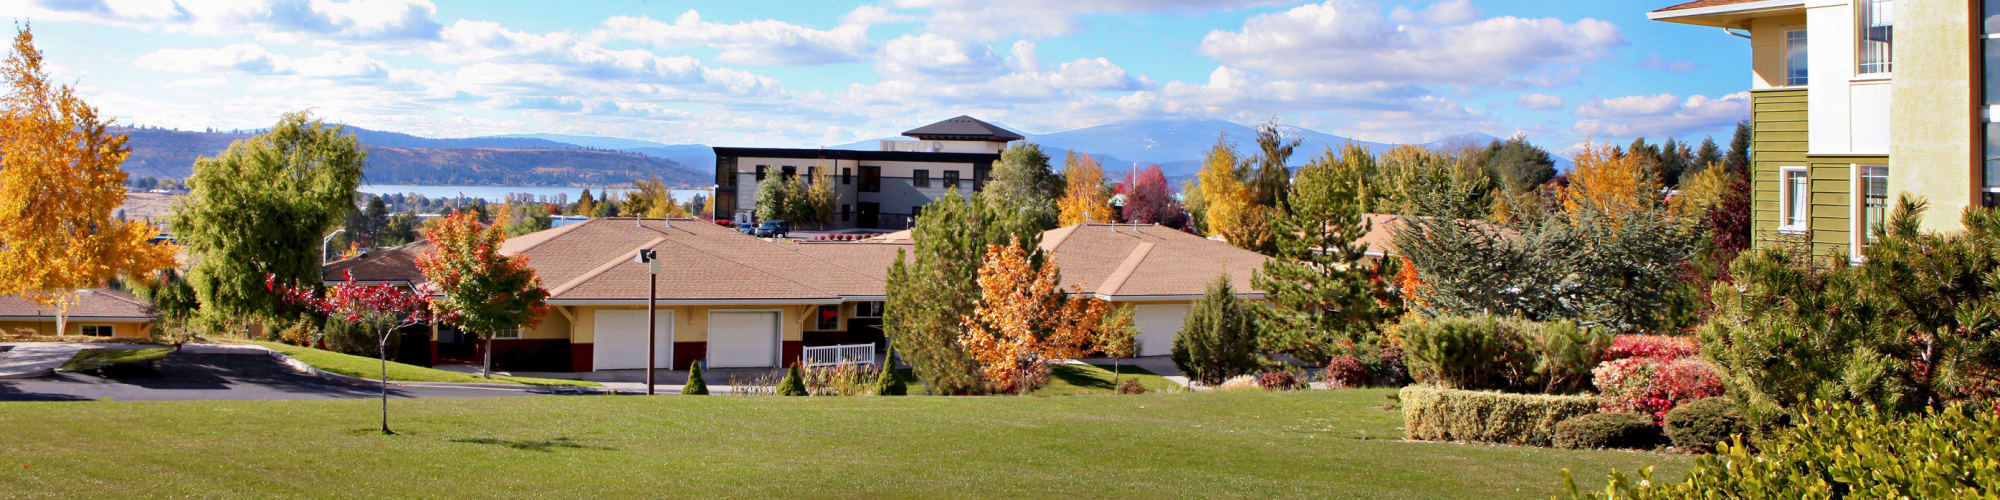 Our community at Crystal Terrace of Klamath Falls in Klamath Falls, Oregon